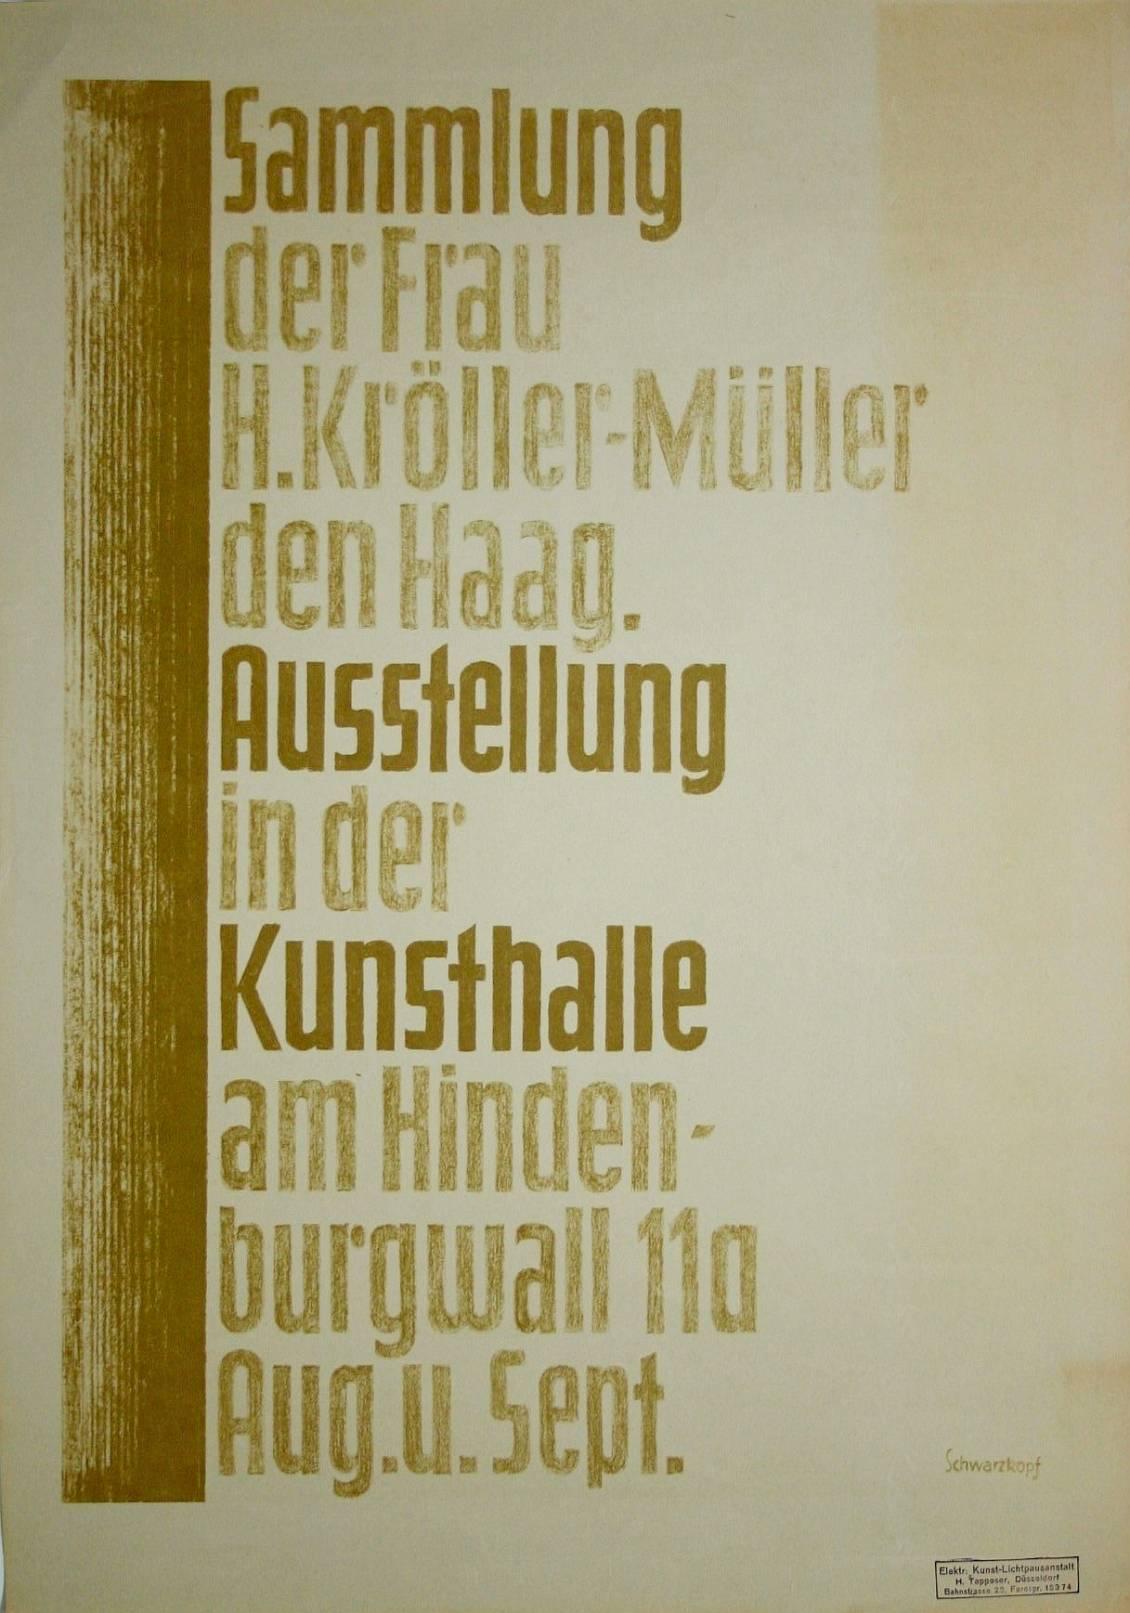 Poster Kunsthalle Düsseldorf, Sammlung der Frau H.Kröller Den Haag, 1928